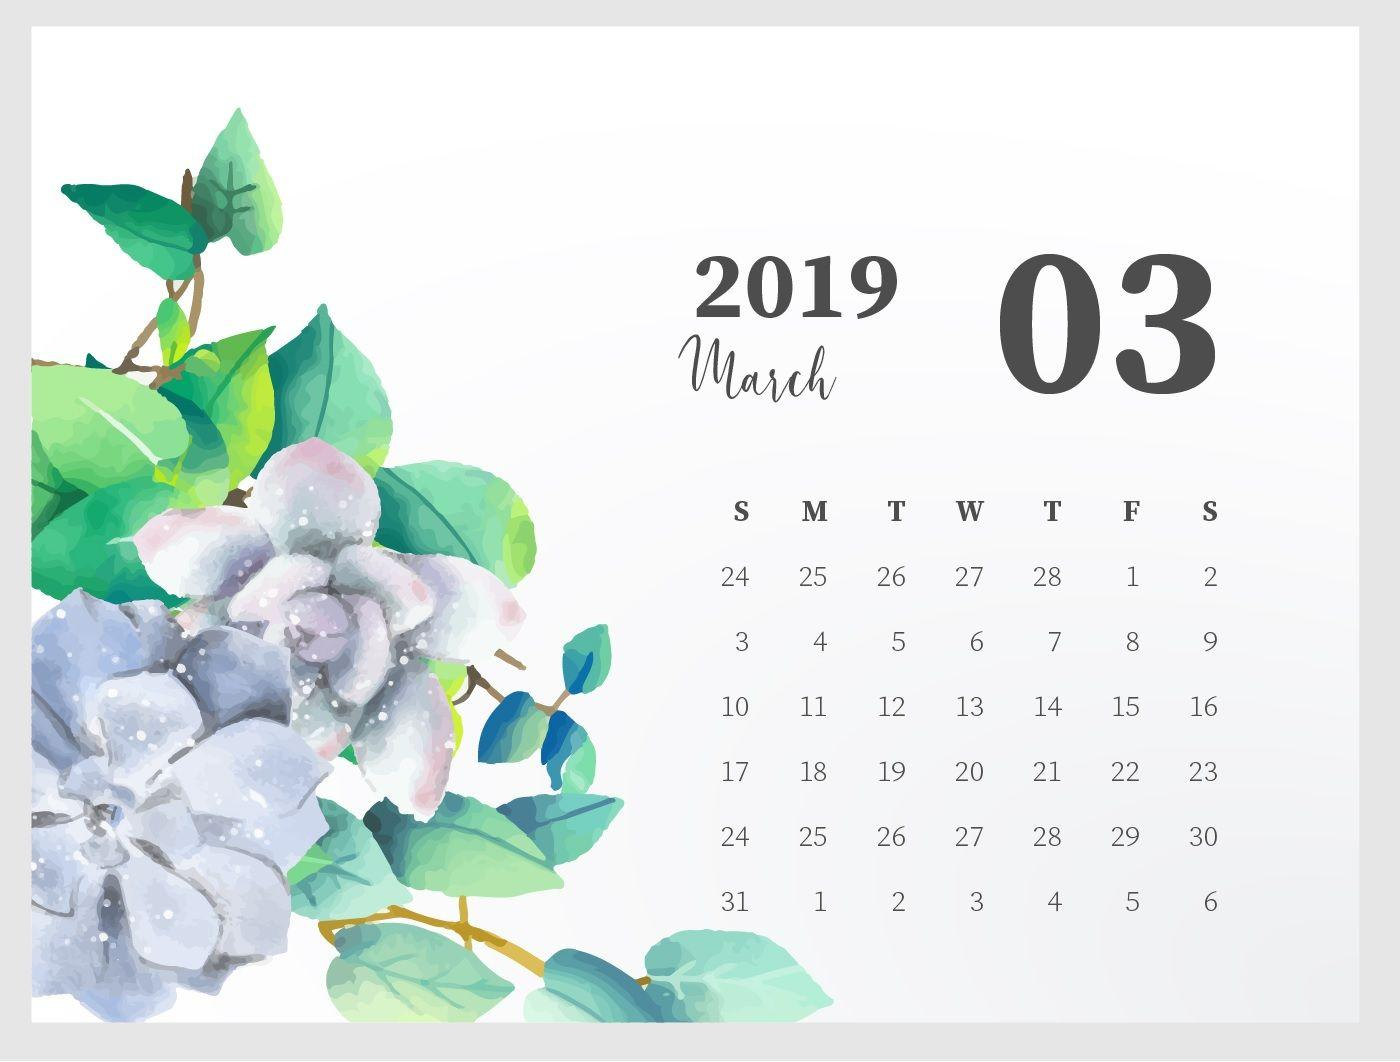 March 2019 Calendar Wallpapers Wallpaper Cave